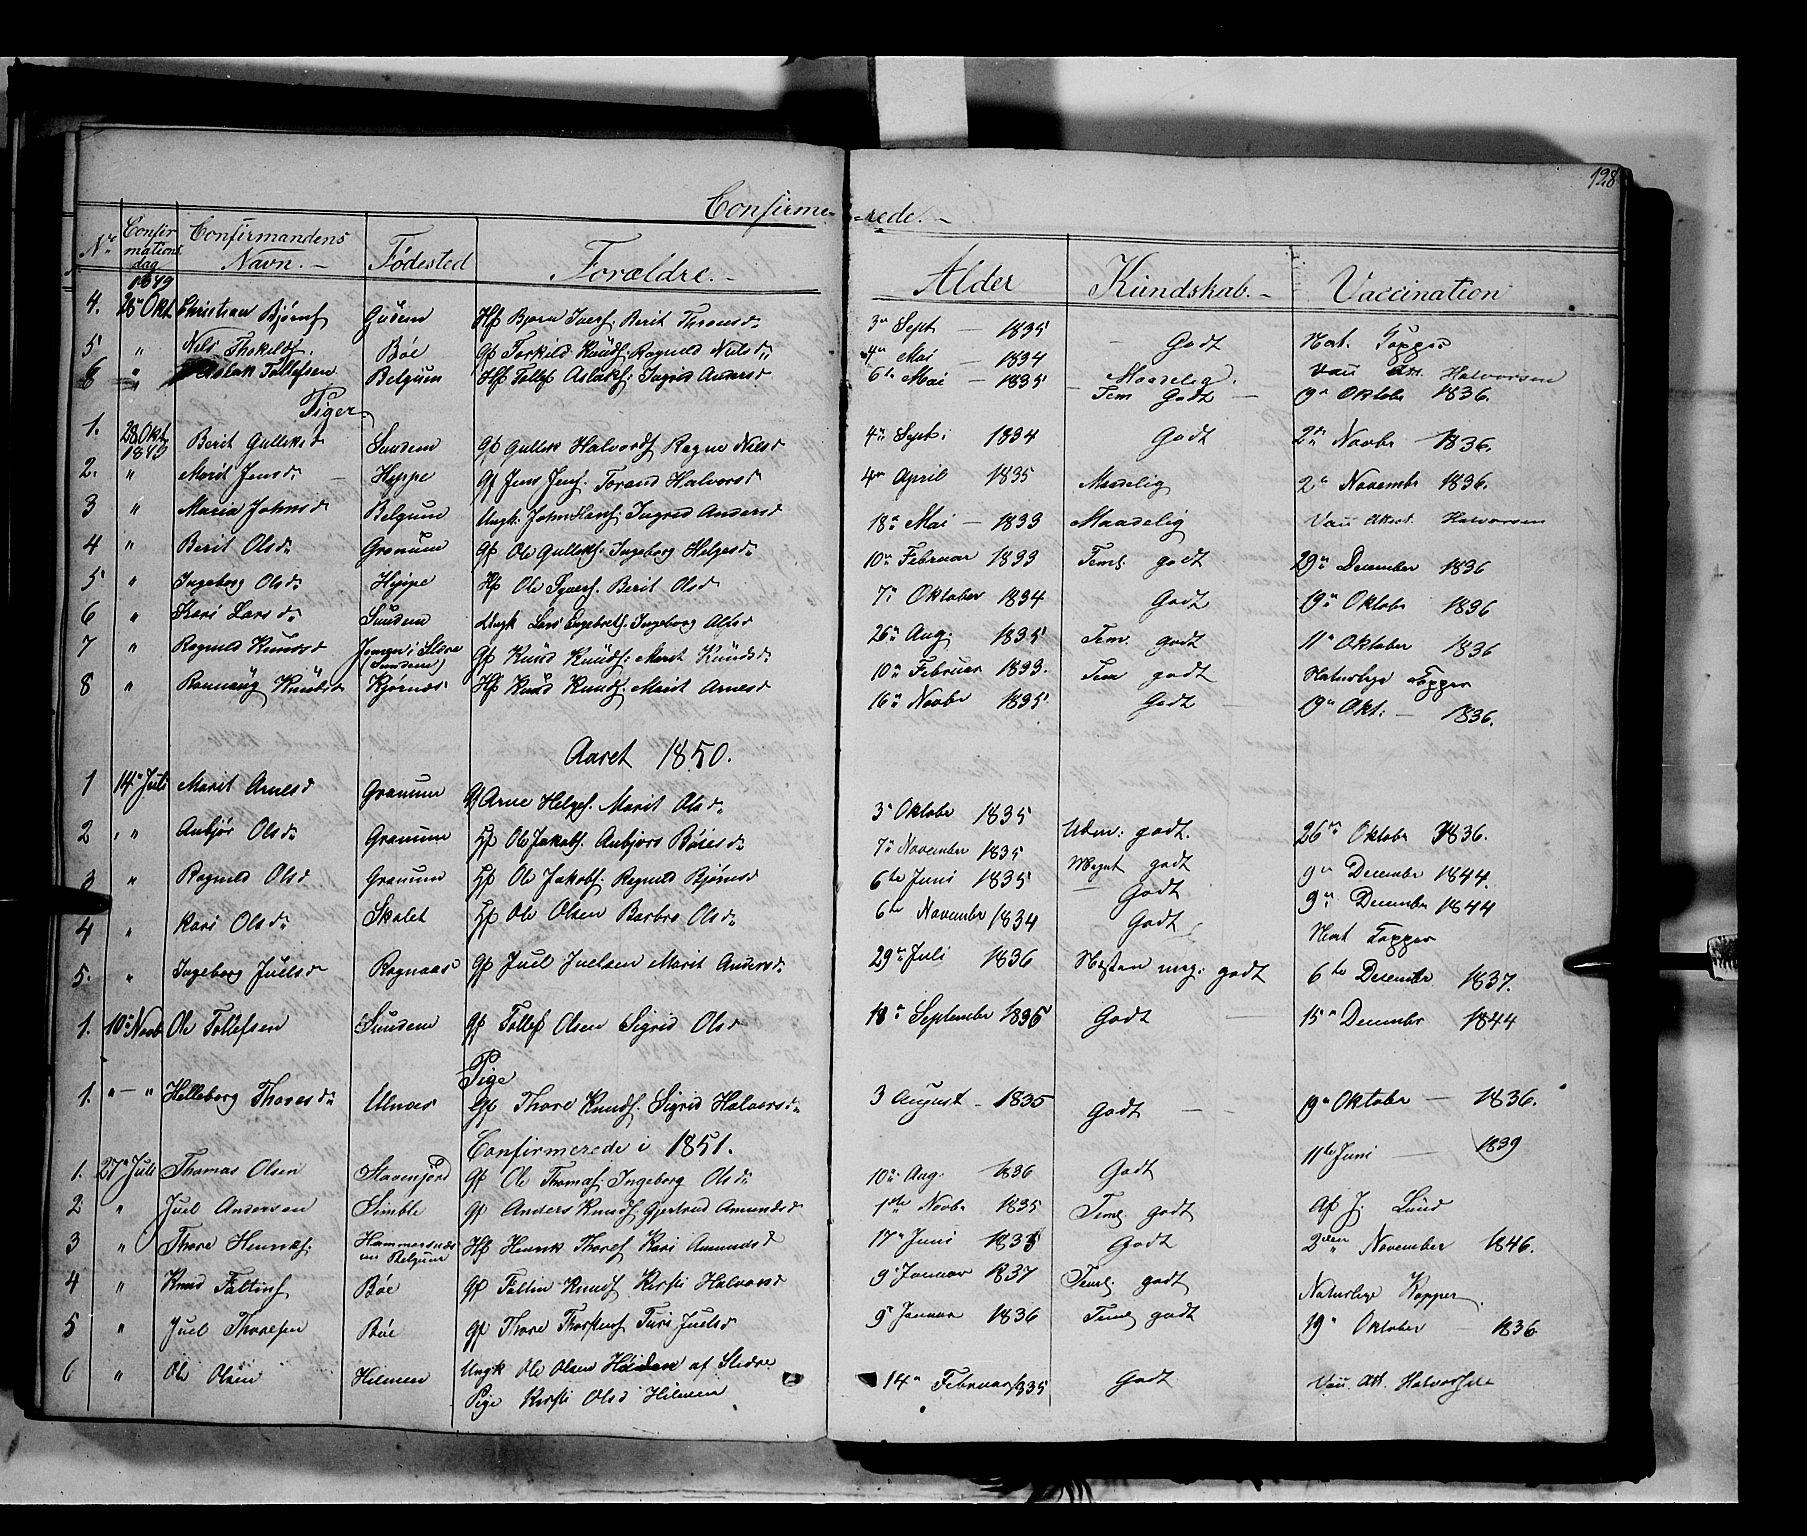 SAH, Nord-Aurdal prestekontor, Ministerialbok nr. 6, 1842-1863, s. 128